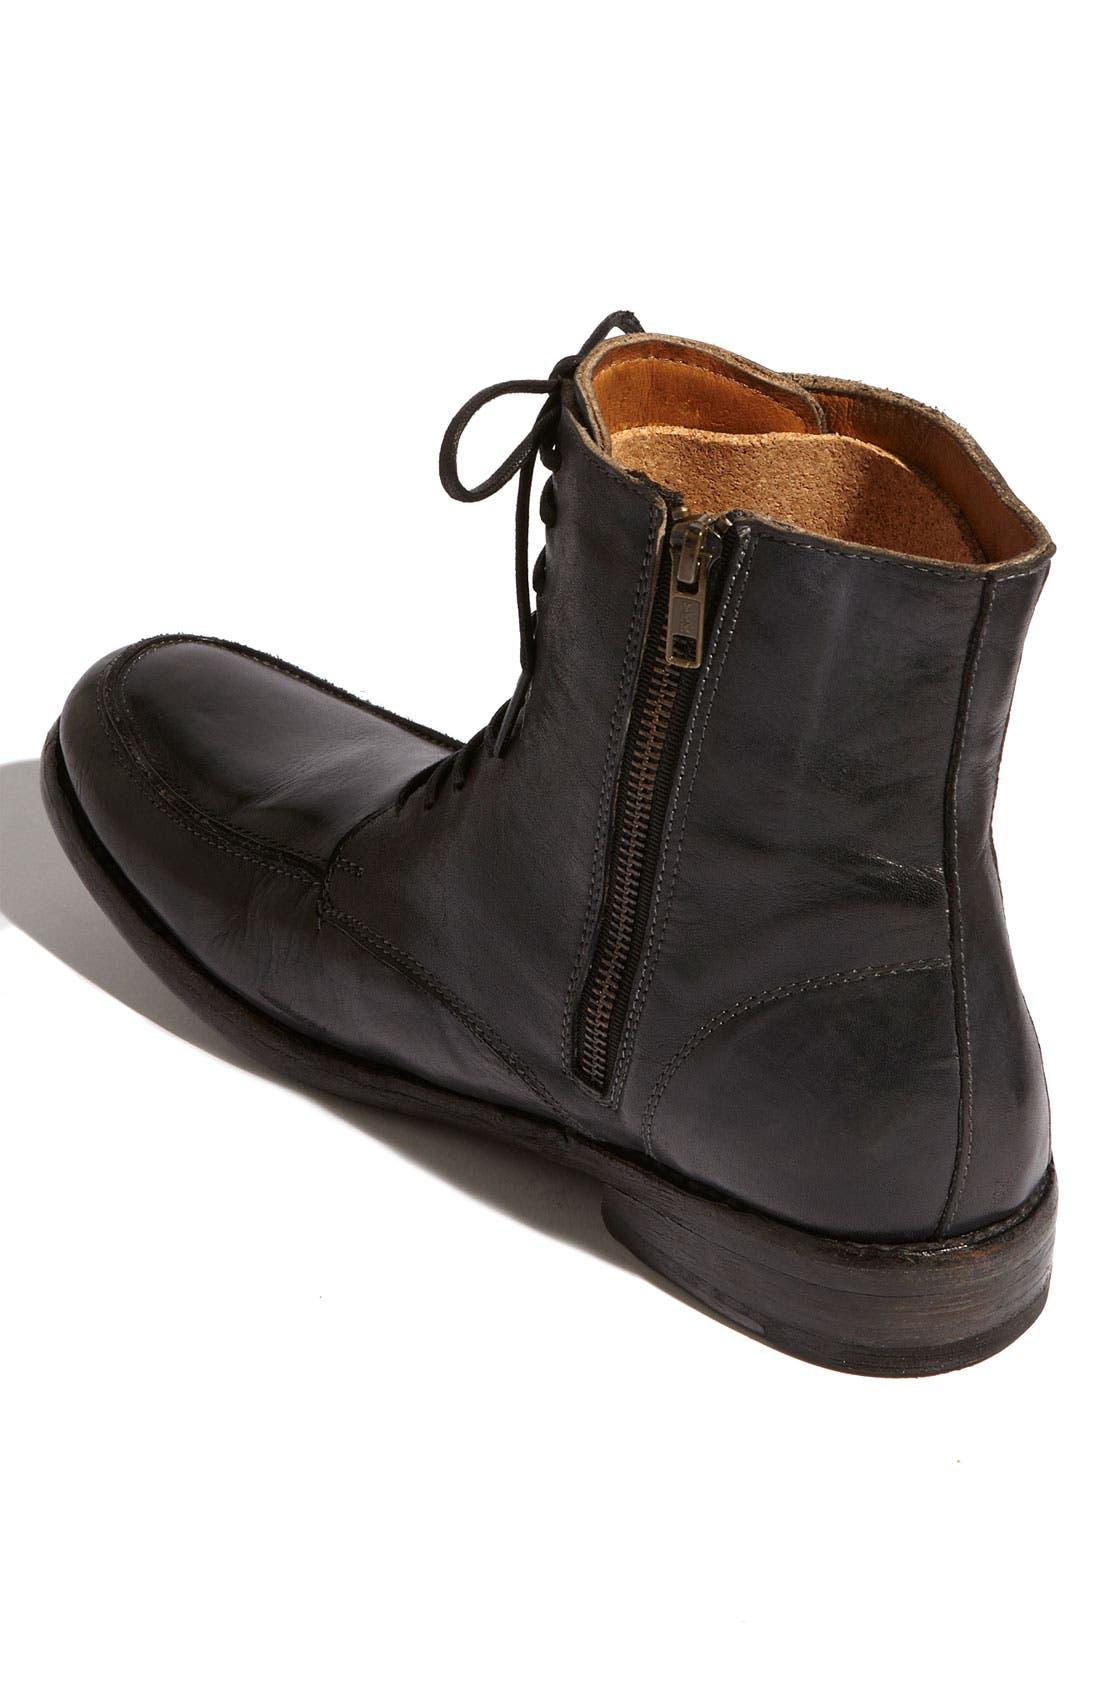 Alternate Image 3  - Bed Stu 'Leo' Boot (Online Only)